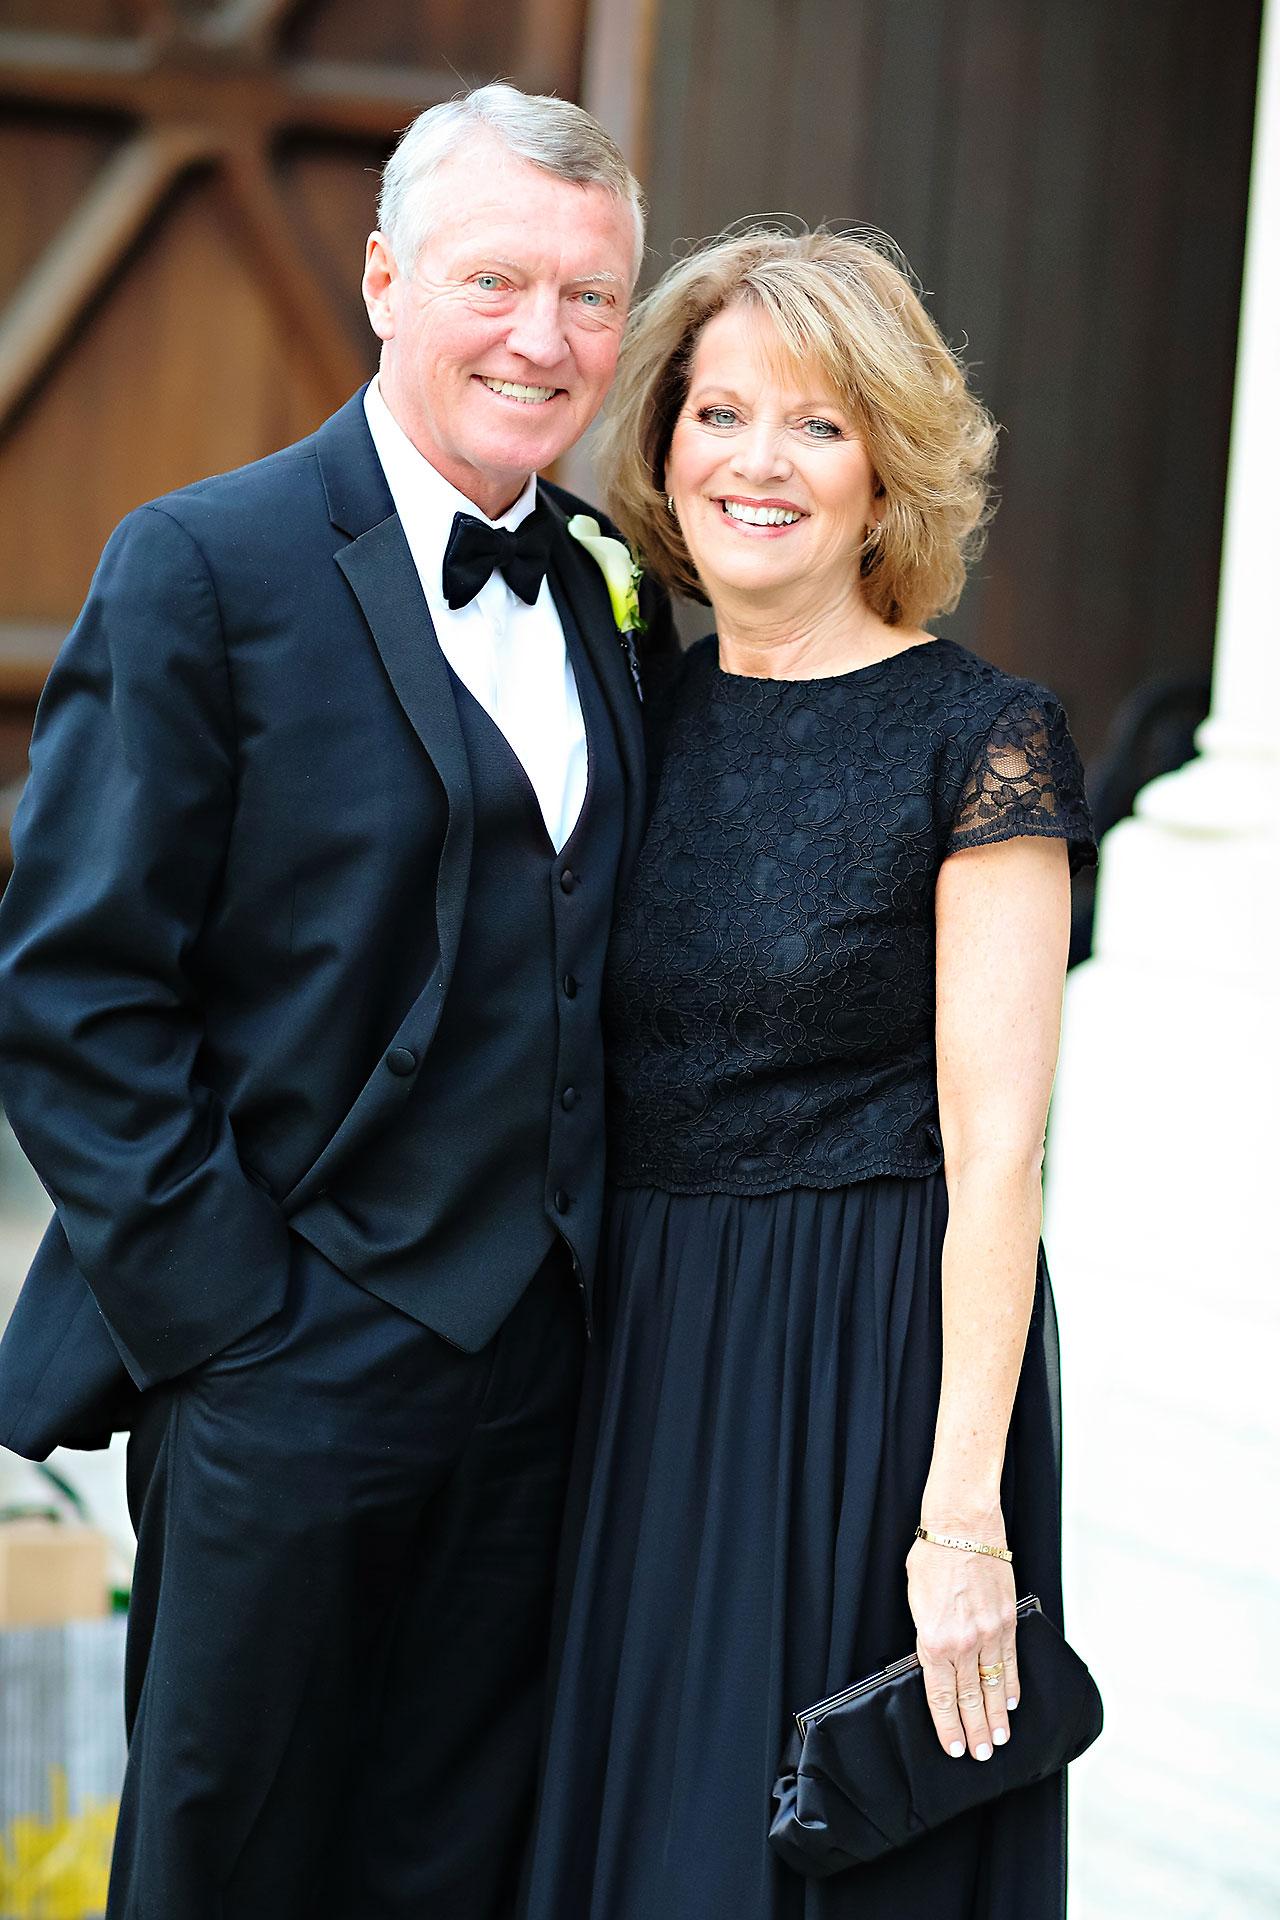 Mallory Wayne Columbia Club Indianapolis Wedding 201